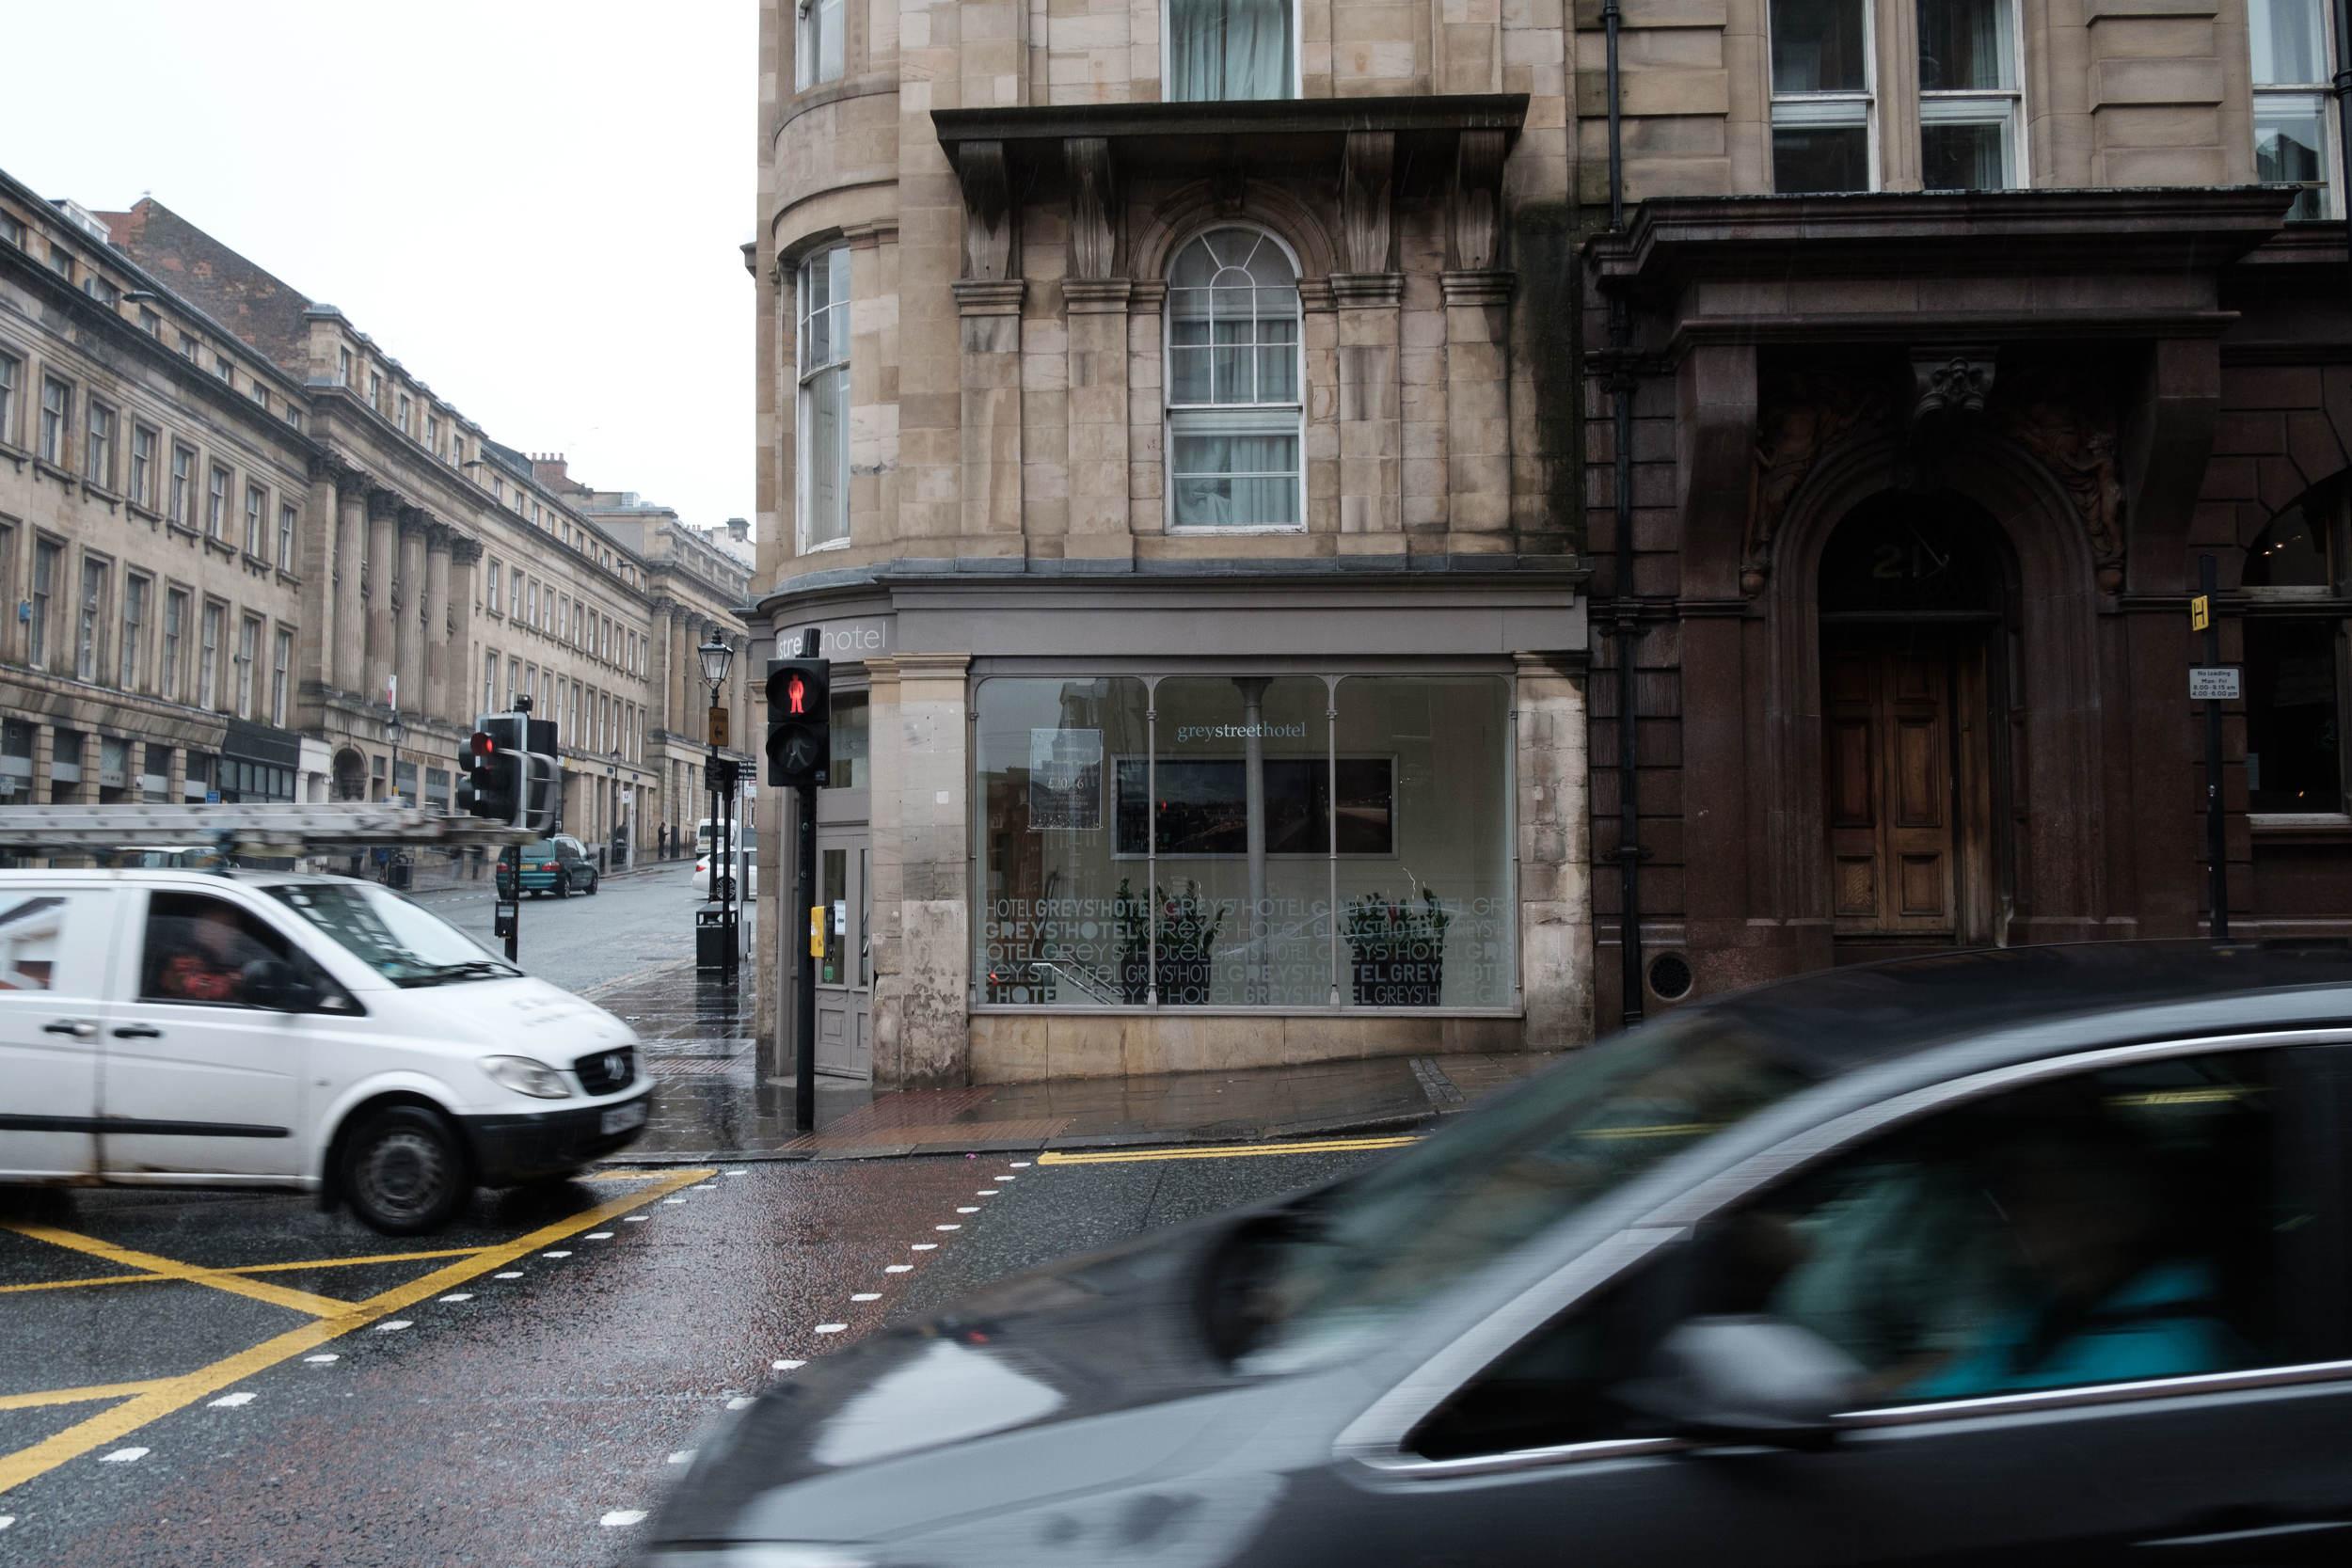 Grey Street Hotel Wedding Venue traffic Newcastle upon Tyne